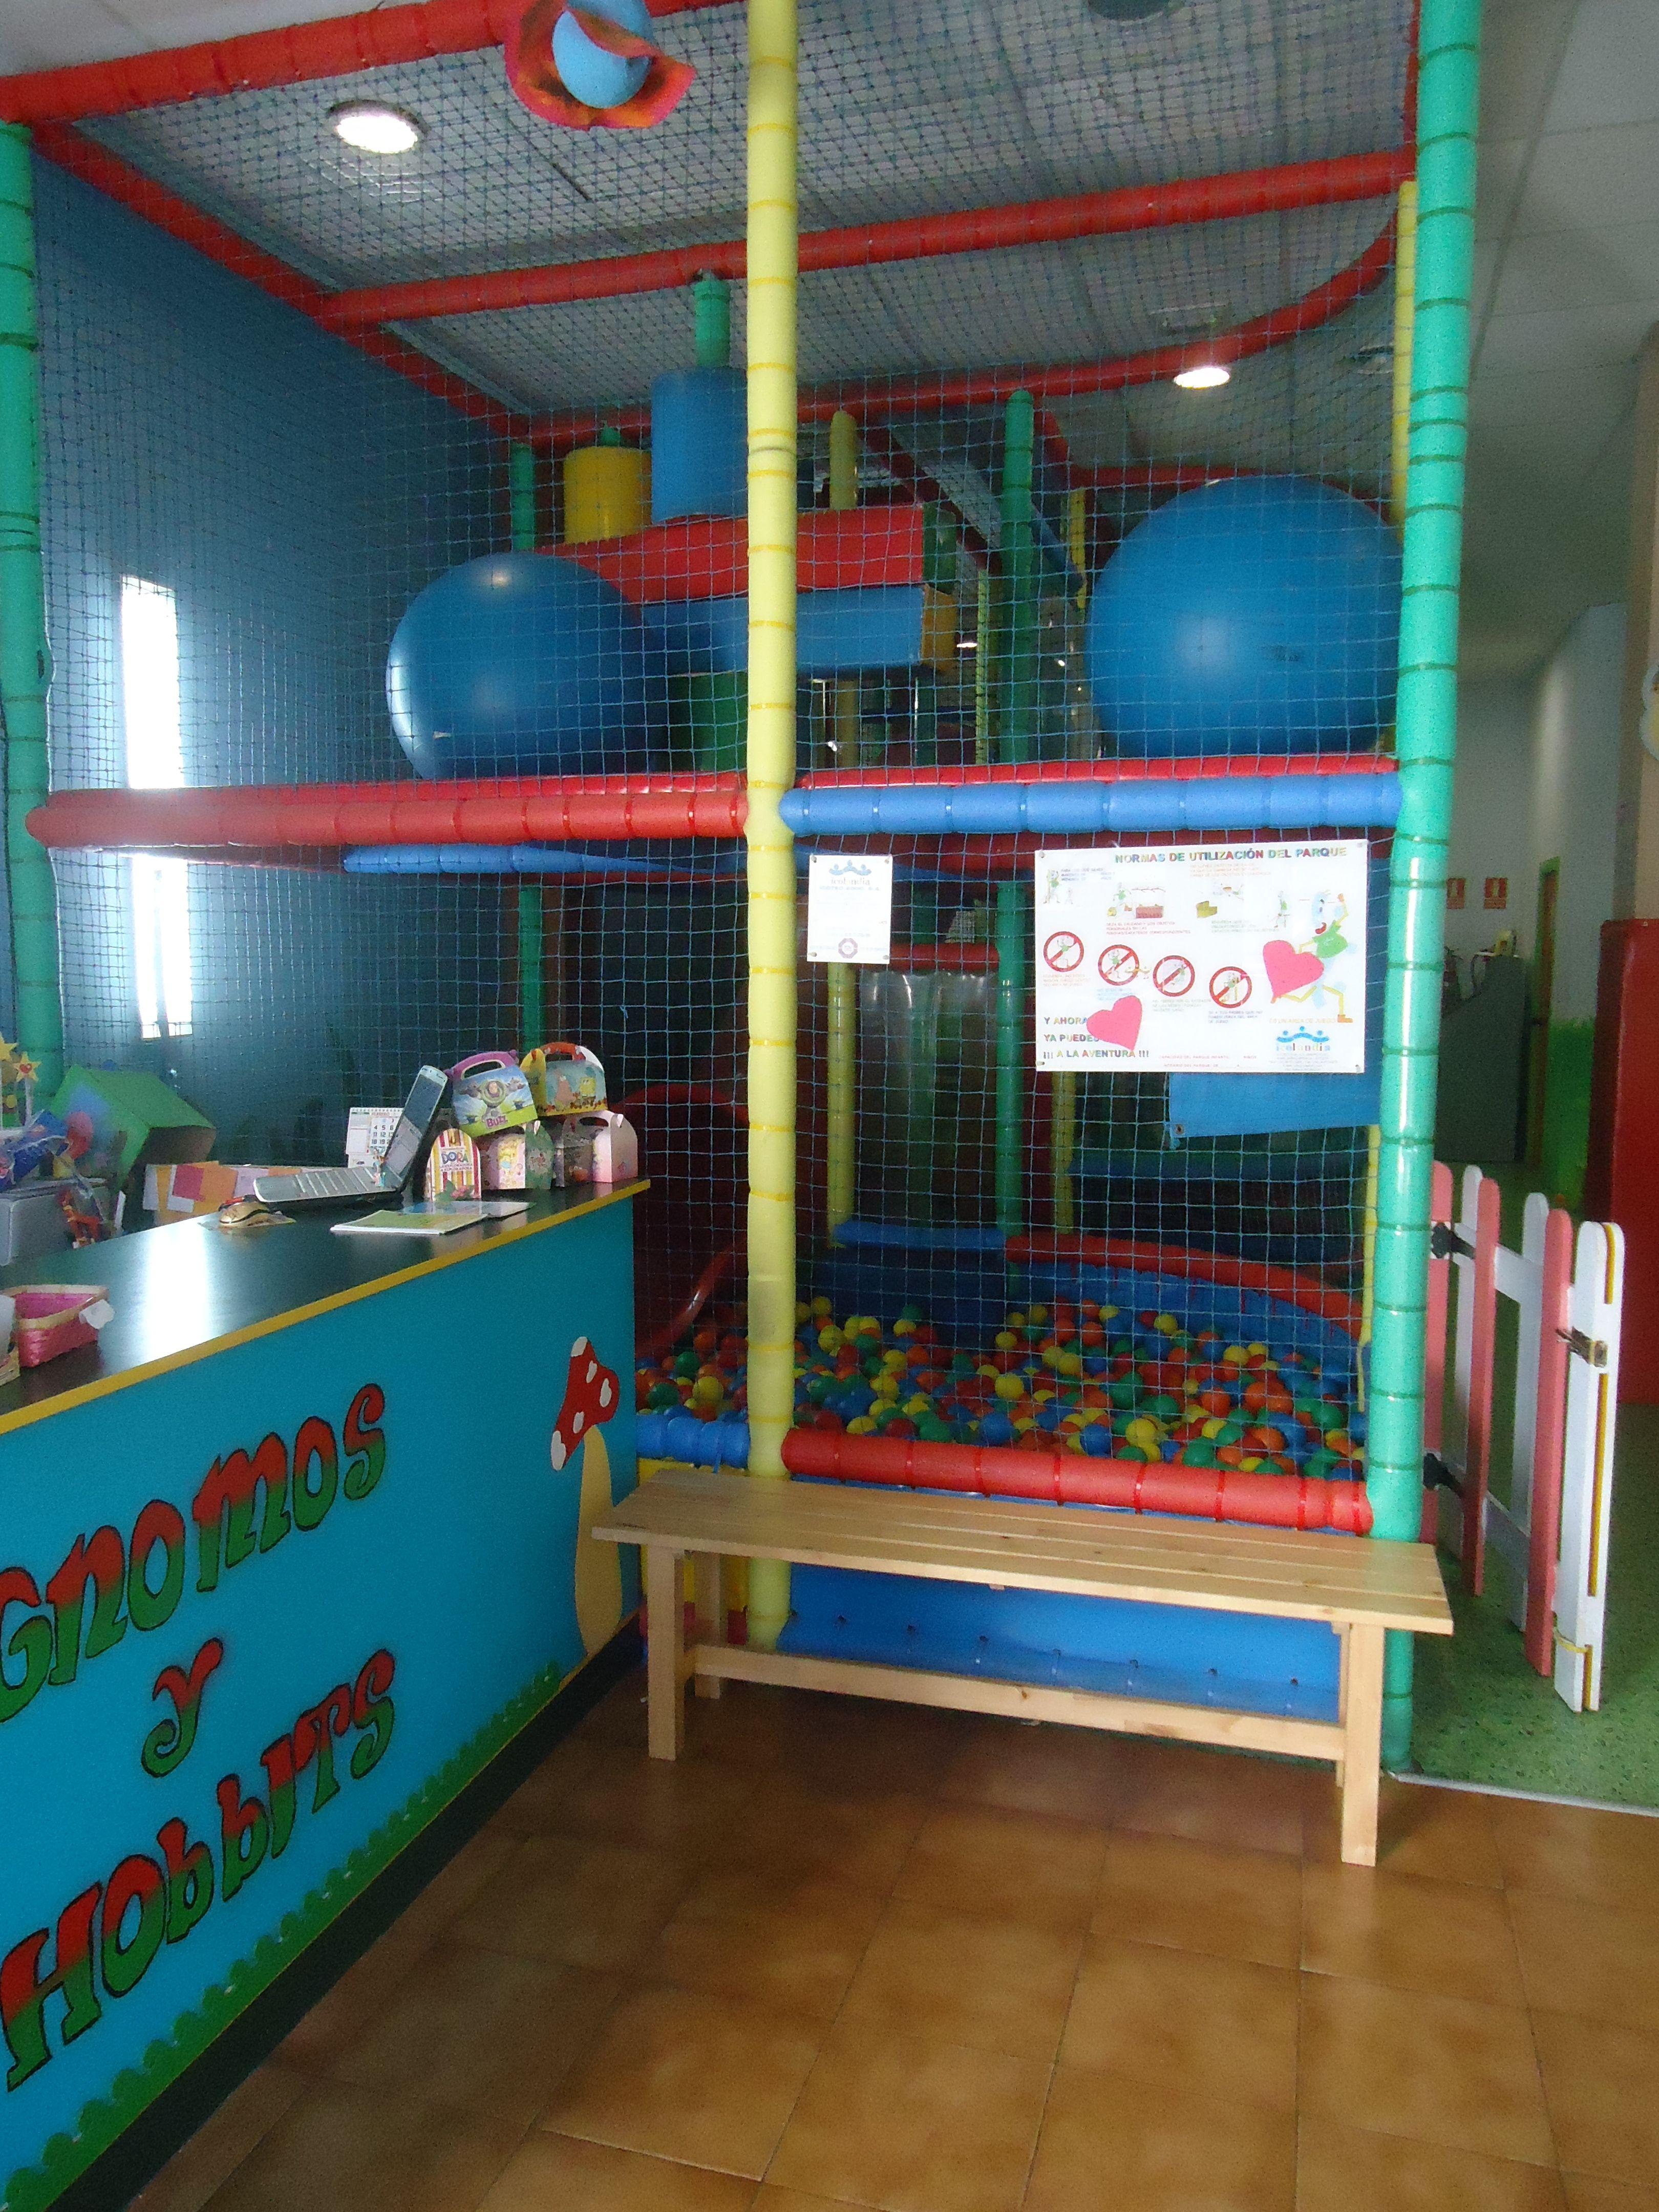 Foto 13 de Parques infantiles en Móstoles | Gnomos y Hobbits